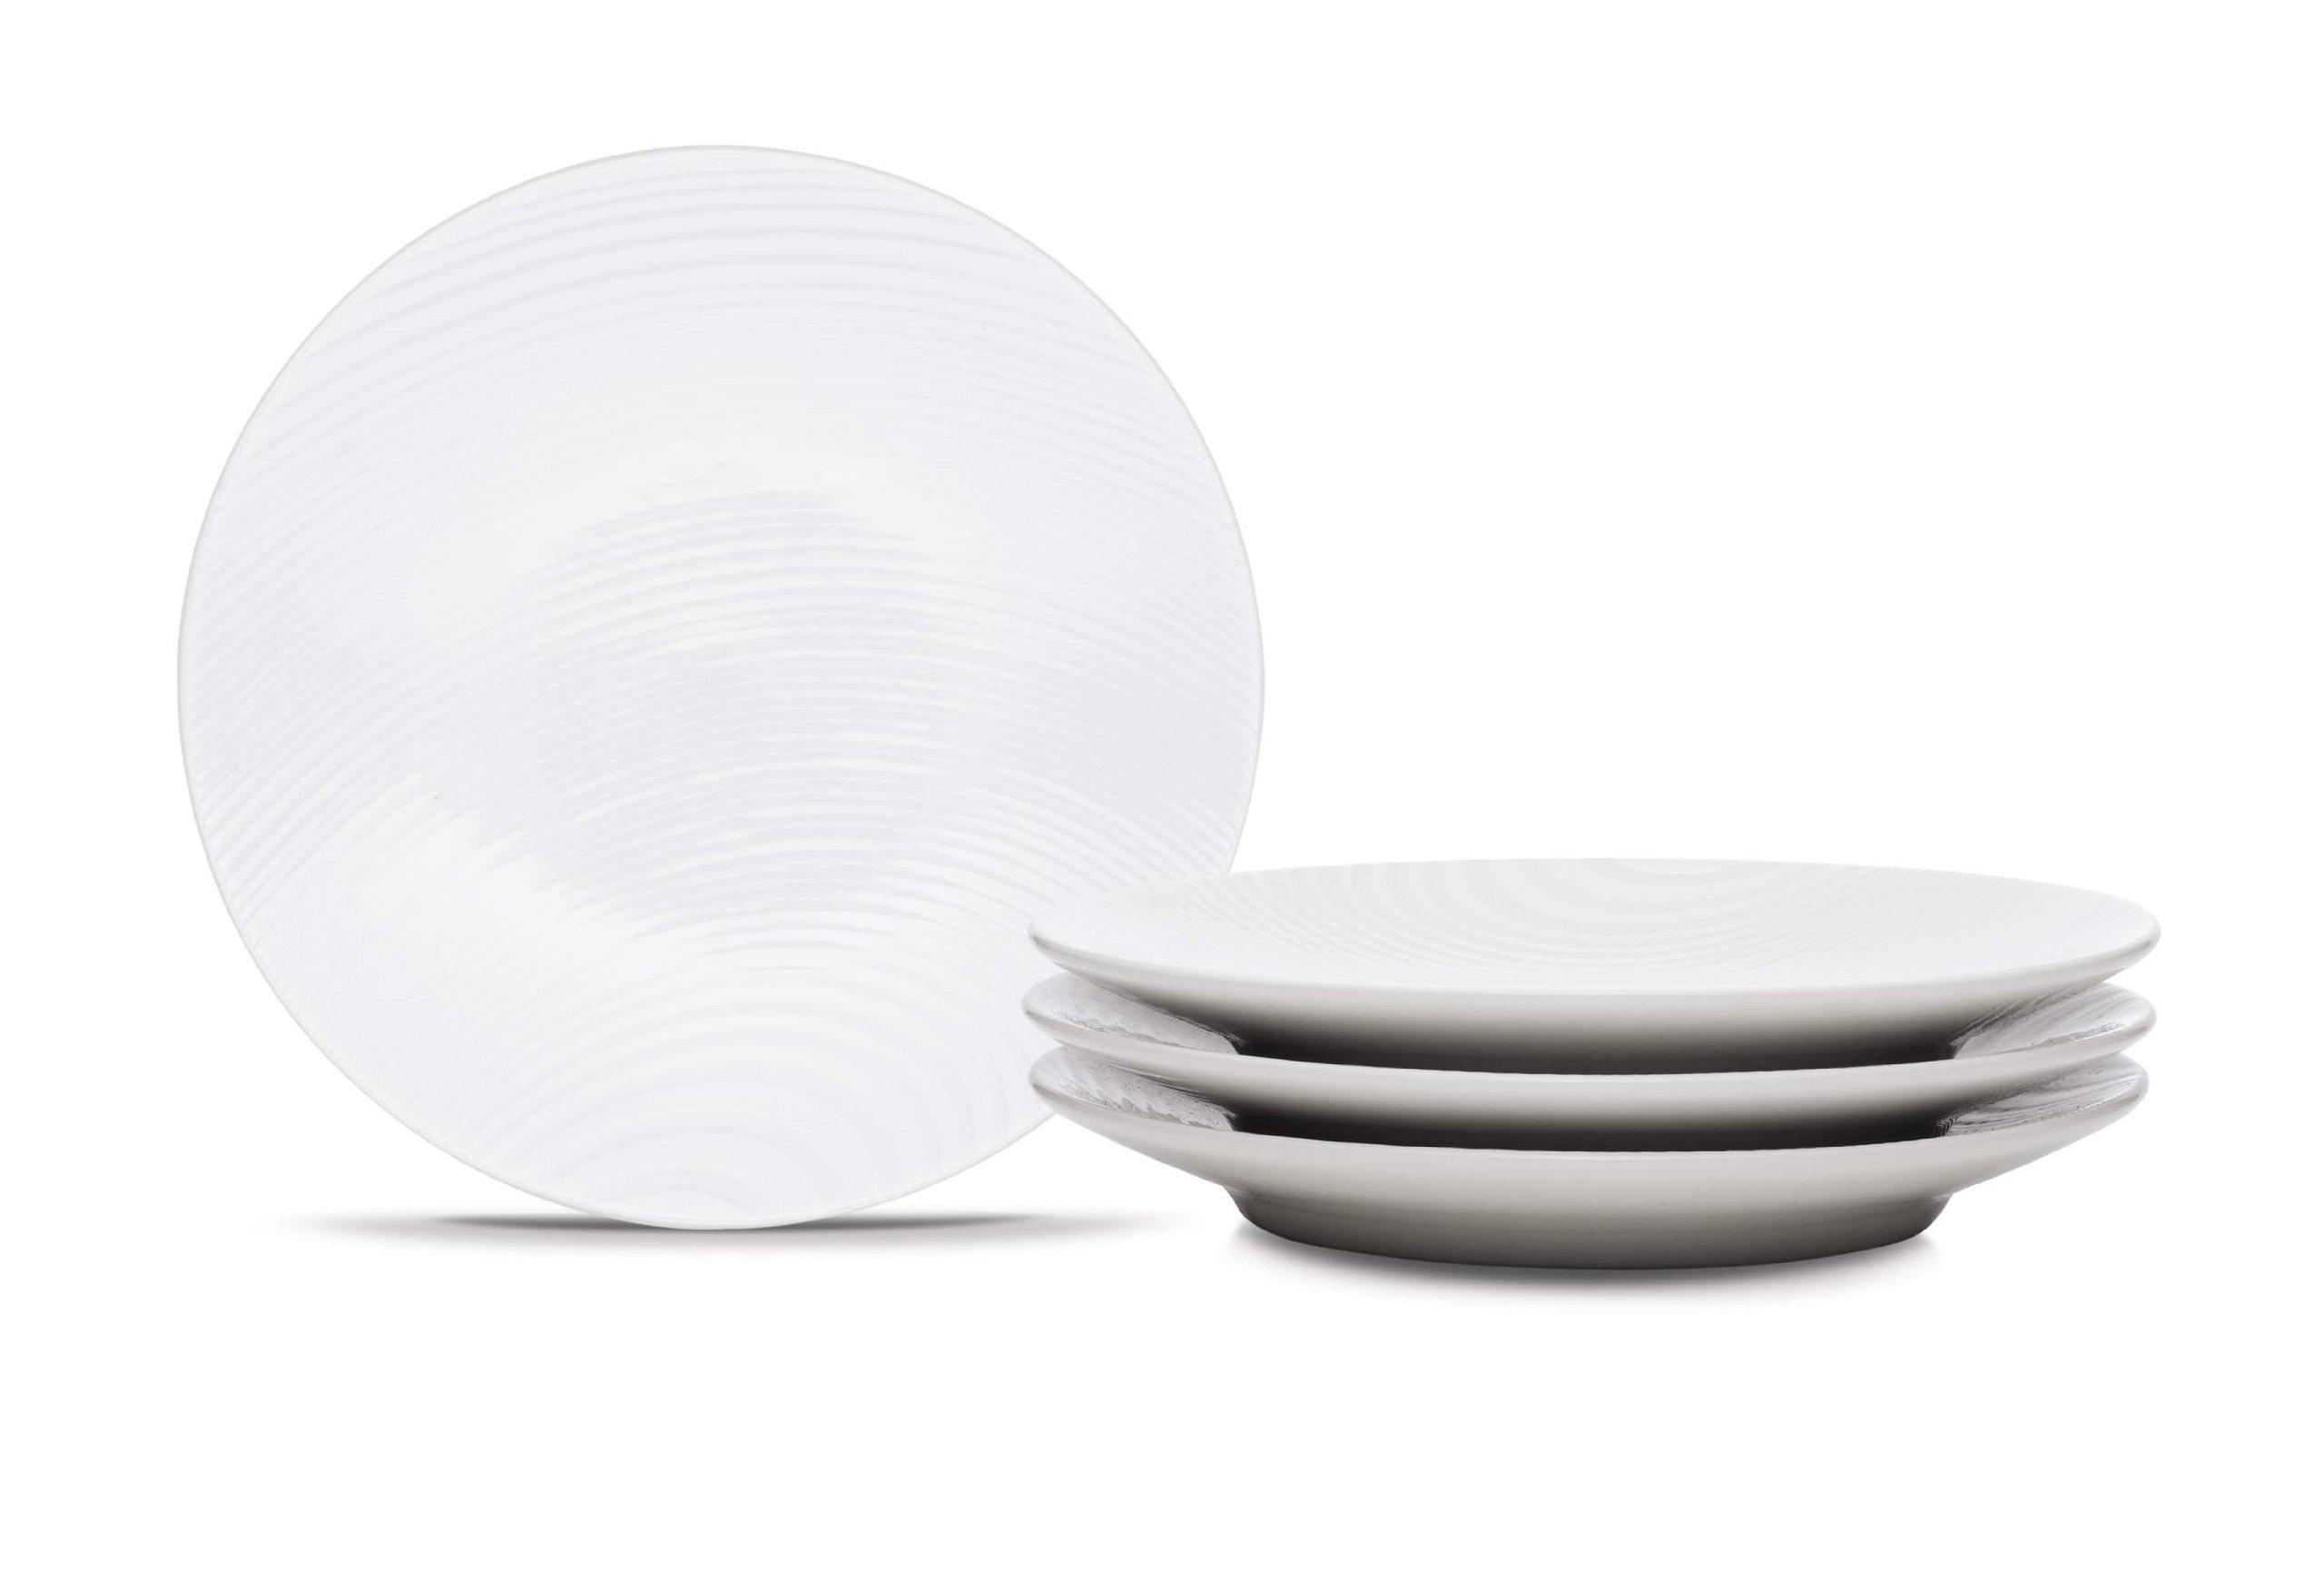 Noritake WOW Dune Appetizer Plates, 6-1/2-Inch, Set